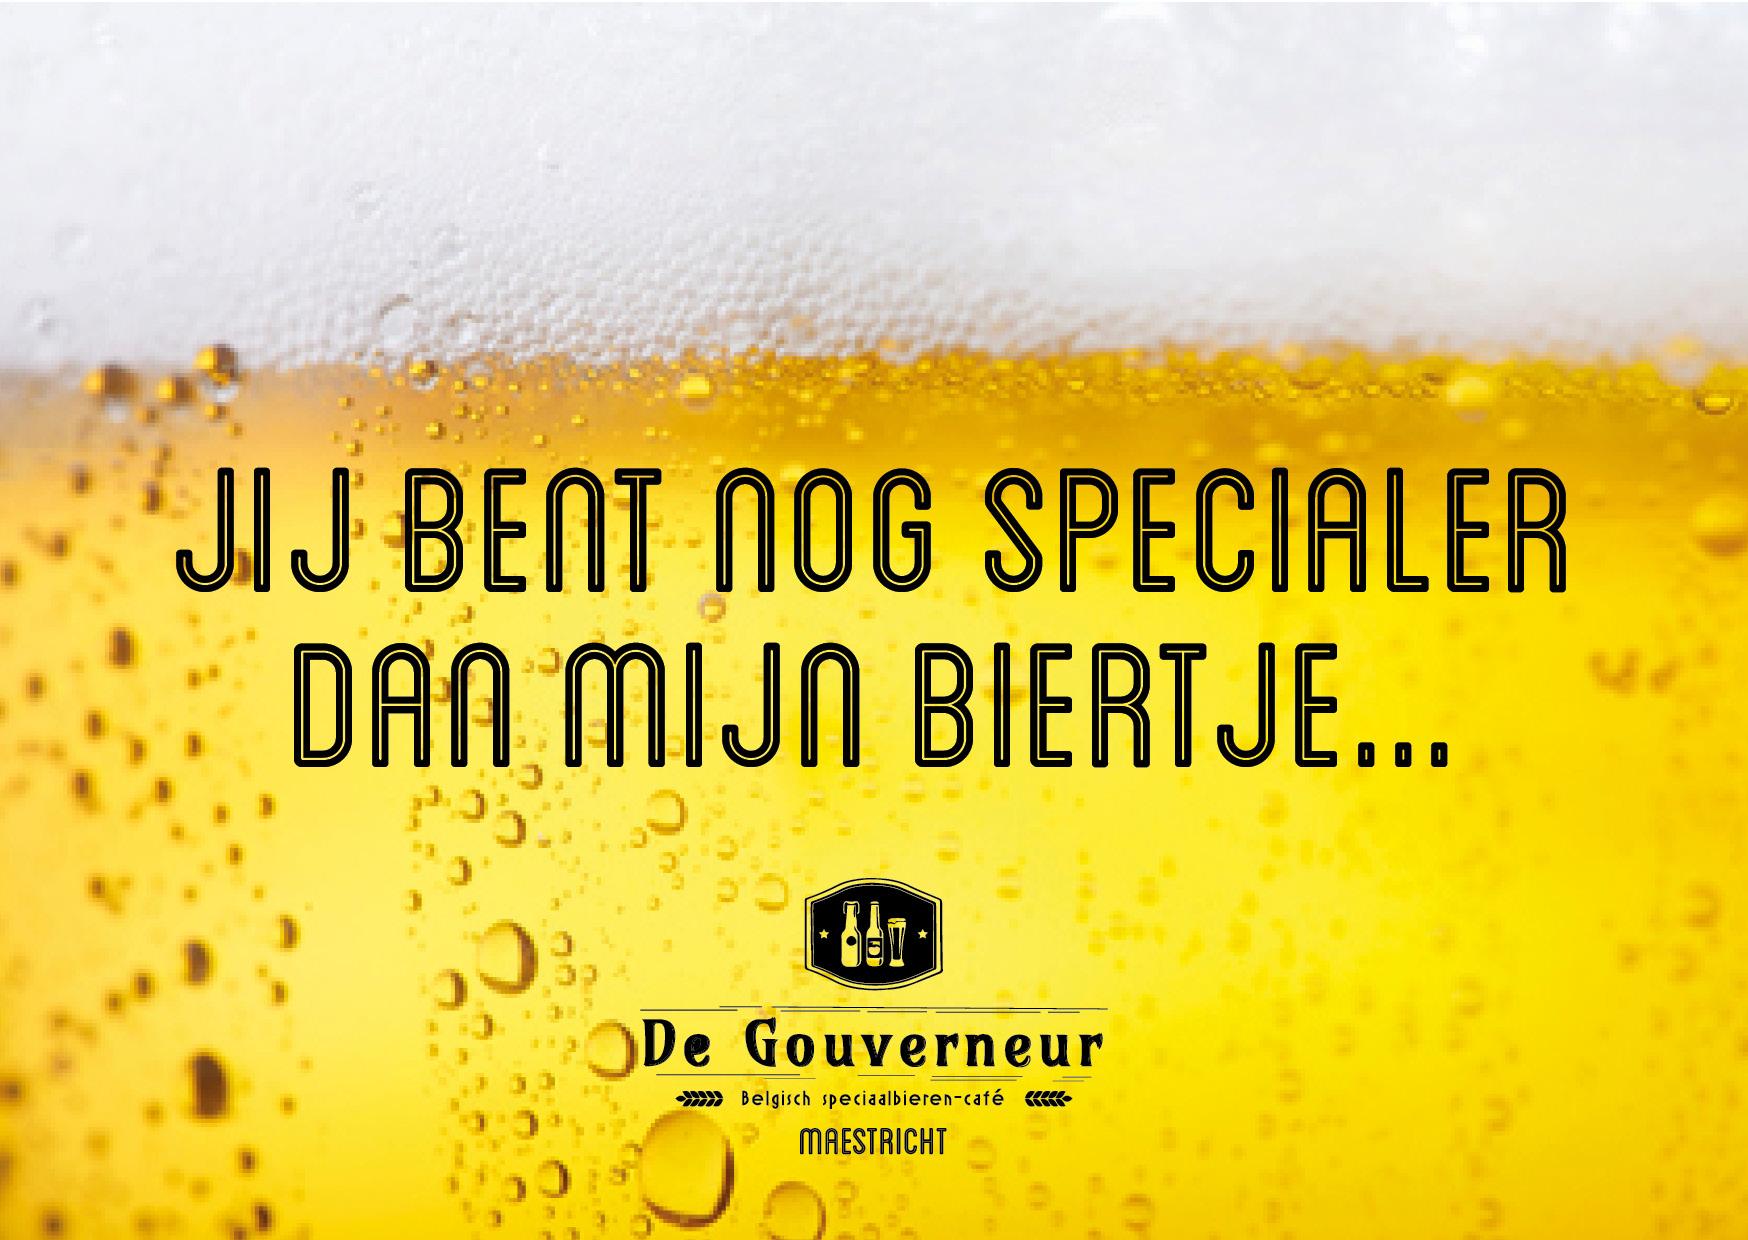 Biertaverne de Gouverneur -  Ansichtkaart - Bier